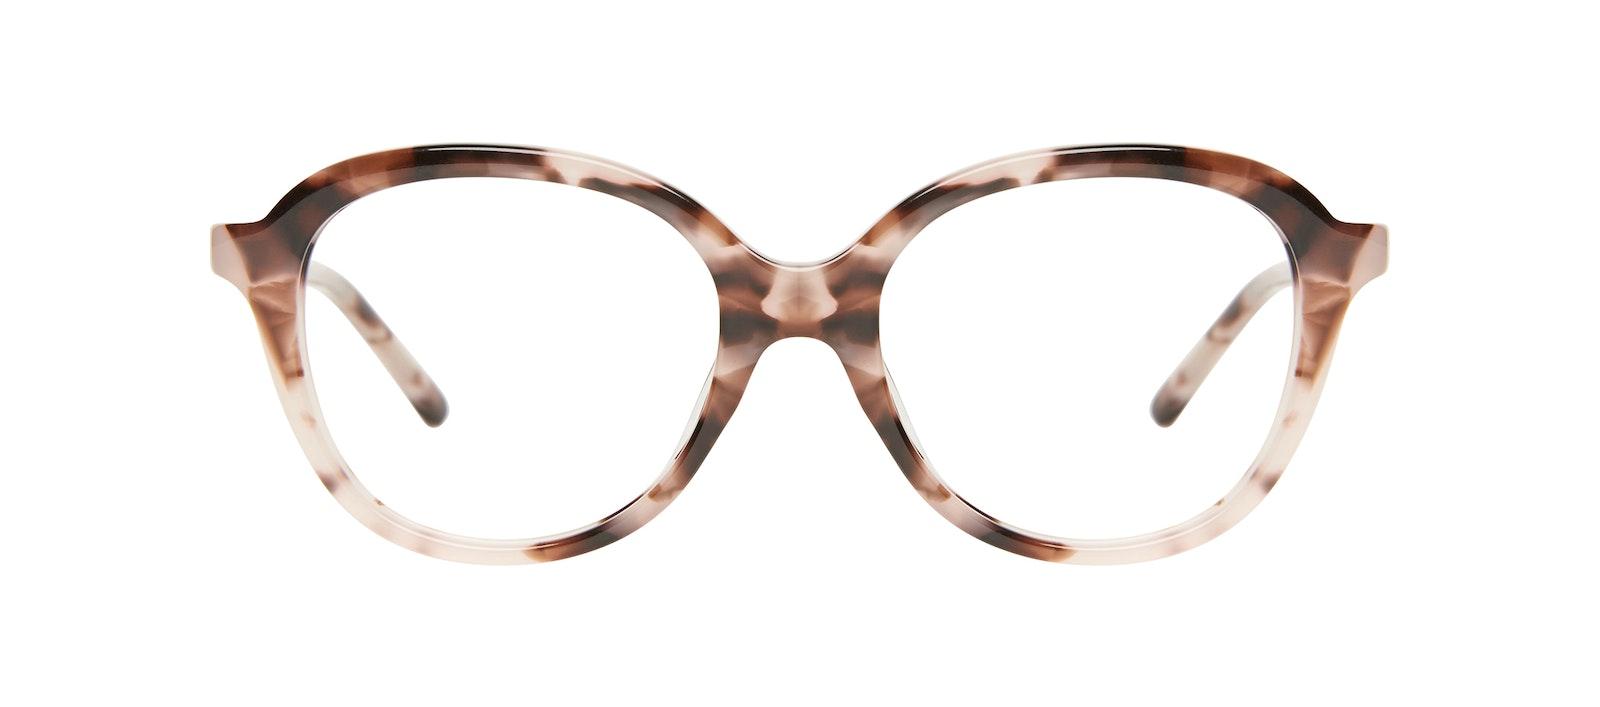 Affordable Fashion Glasses Round Eyeglasses Kids Dream Junior Marbled Pink Front